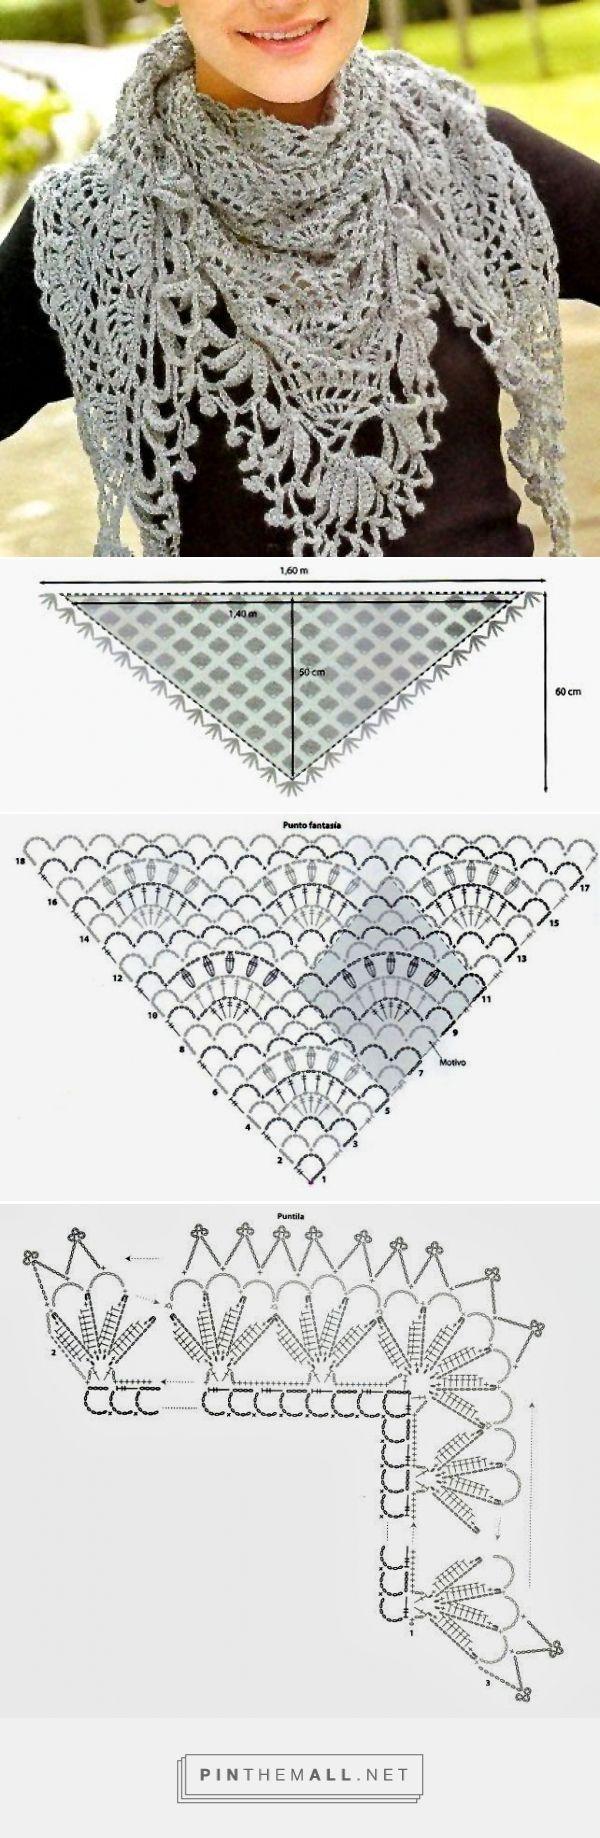 tejidos artesanales en crochet: chal triangular tejido en crochet - created via http://pinthemall.net